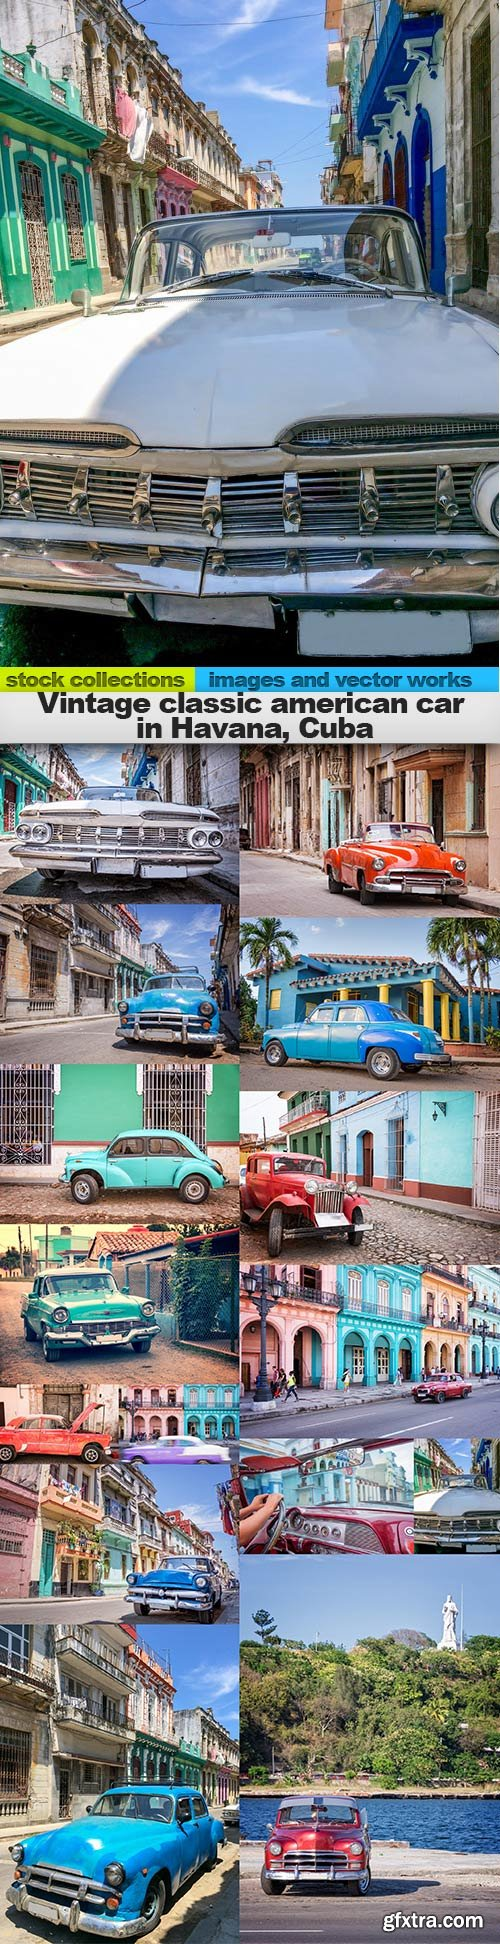 Vintage classic american car in Havana, Cuba, 15 x UHQ JPEG